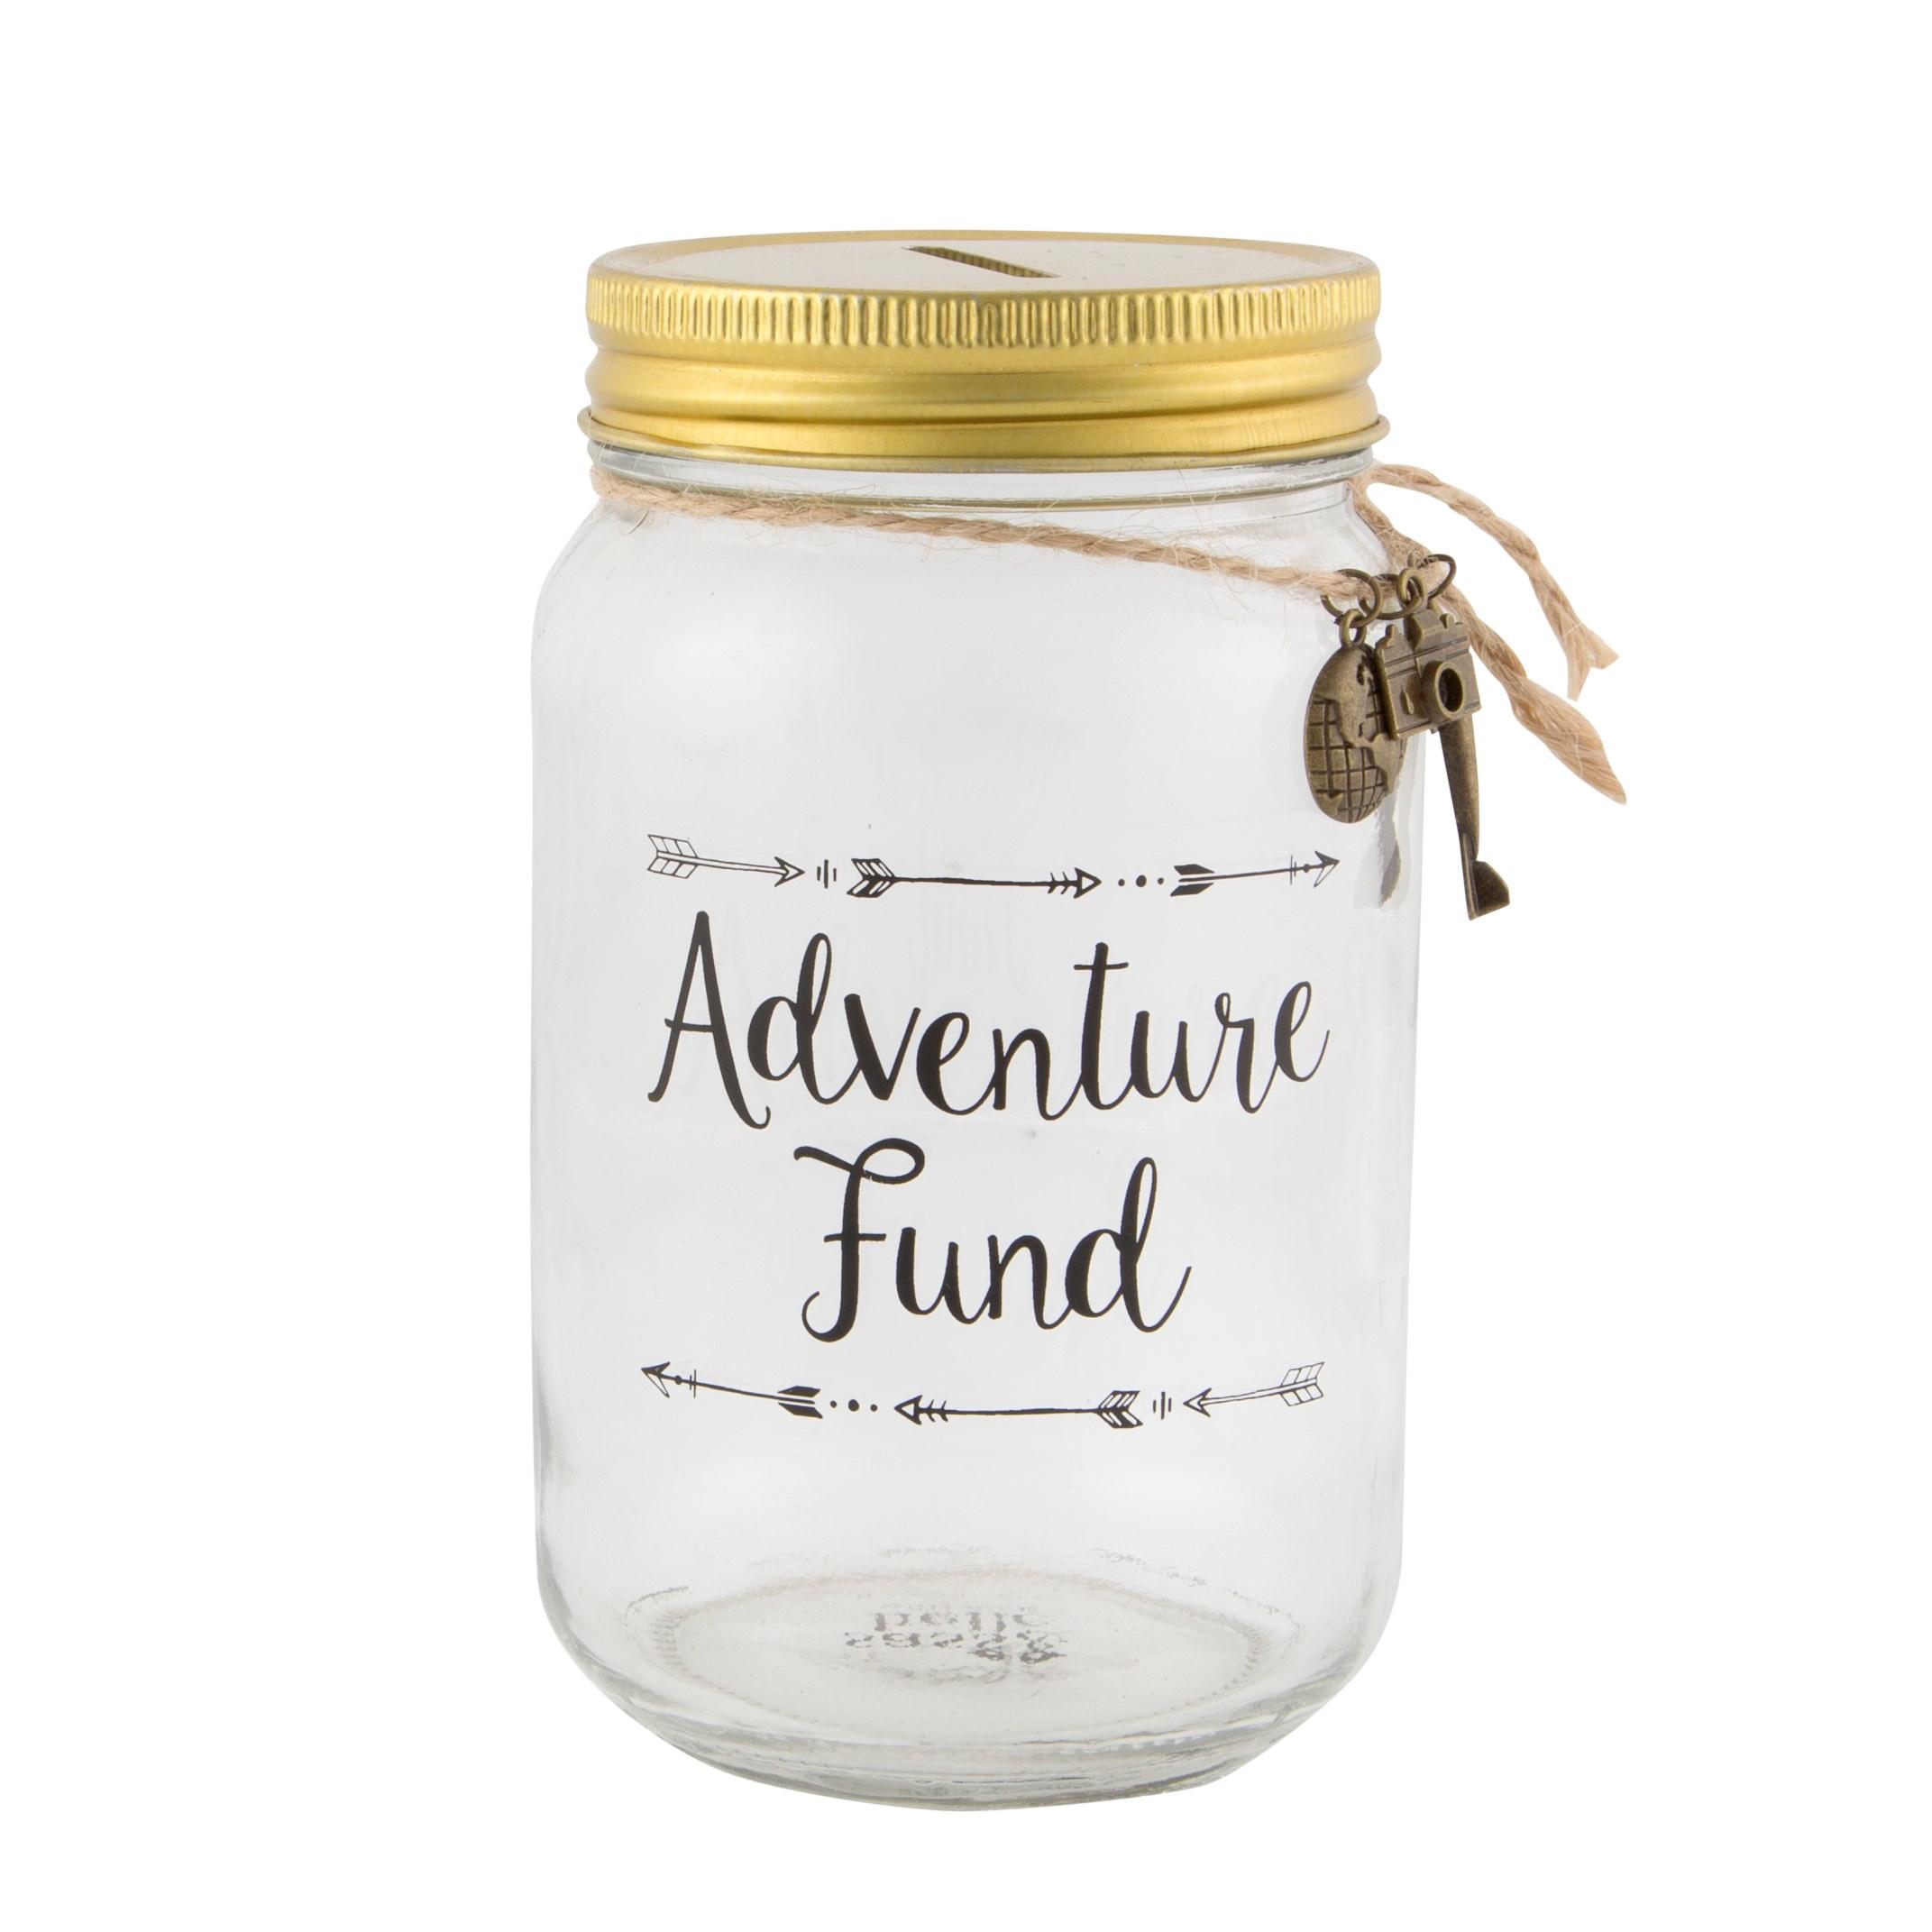 Mealheiro Adventure Fund